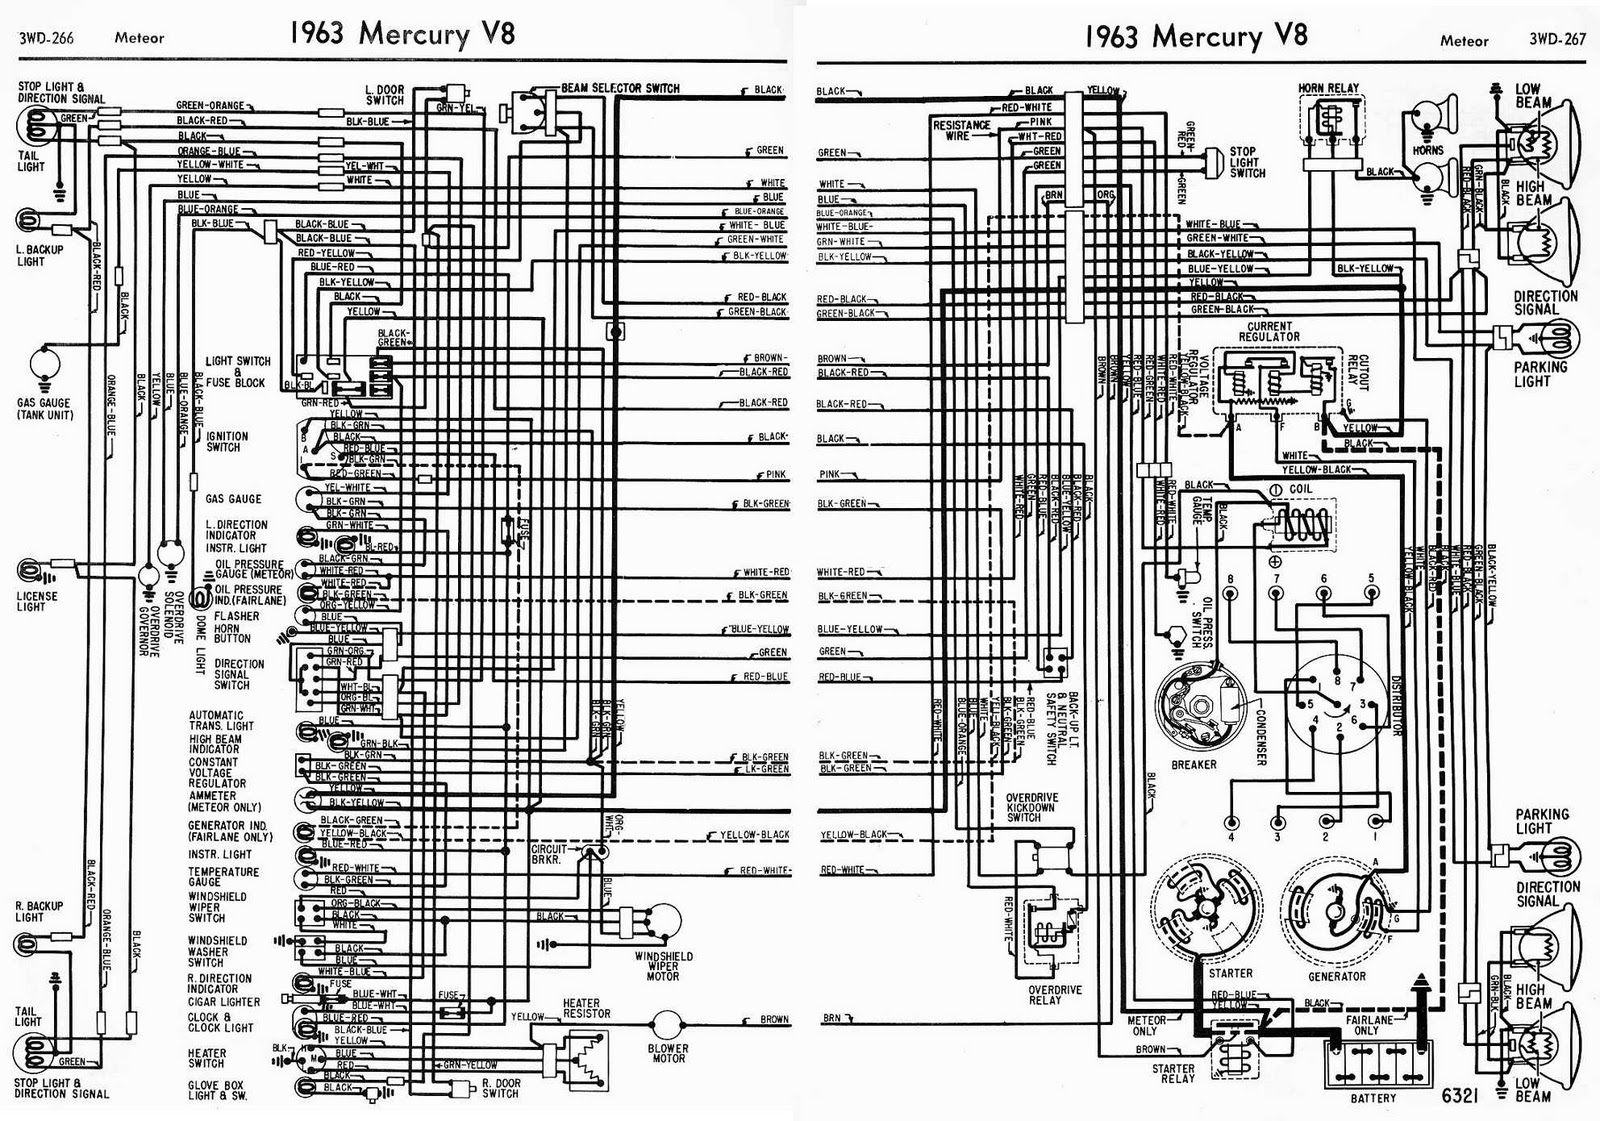 Cb350 Wiring Diagram Get Free Image About 1970 Honda Ct70 Rh Banyan Palace Com